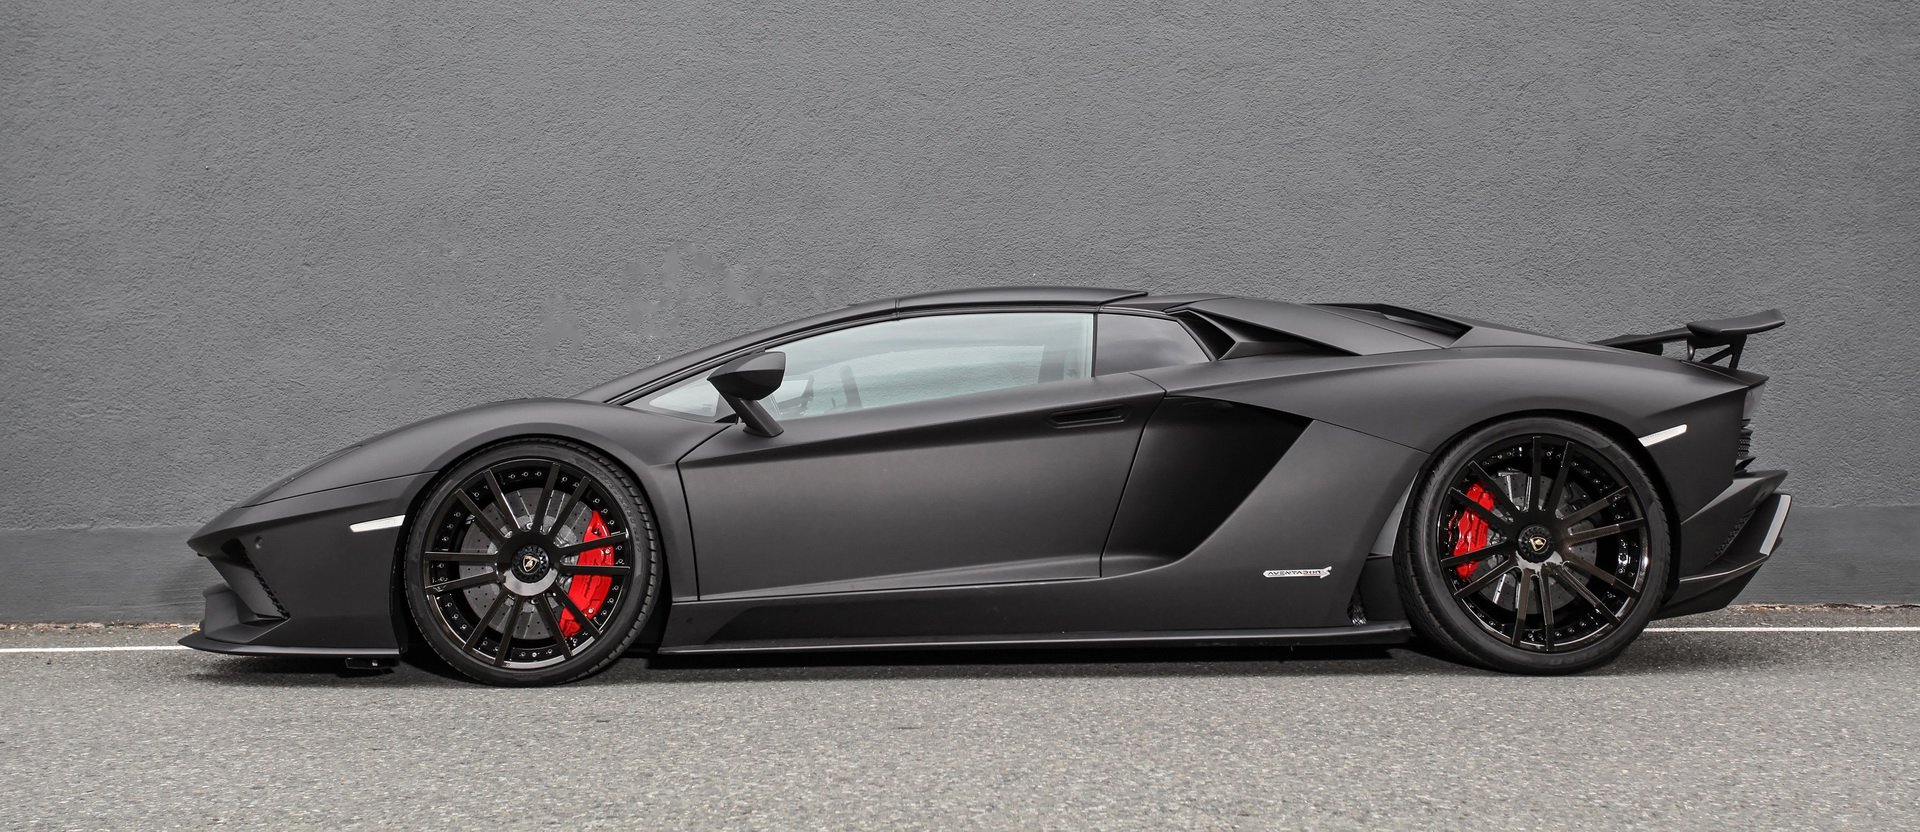 Lamborghini Aventador S Roadster by Wheelsandmore (14)